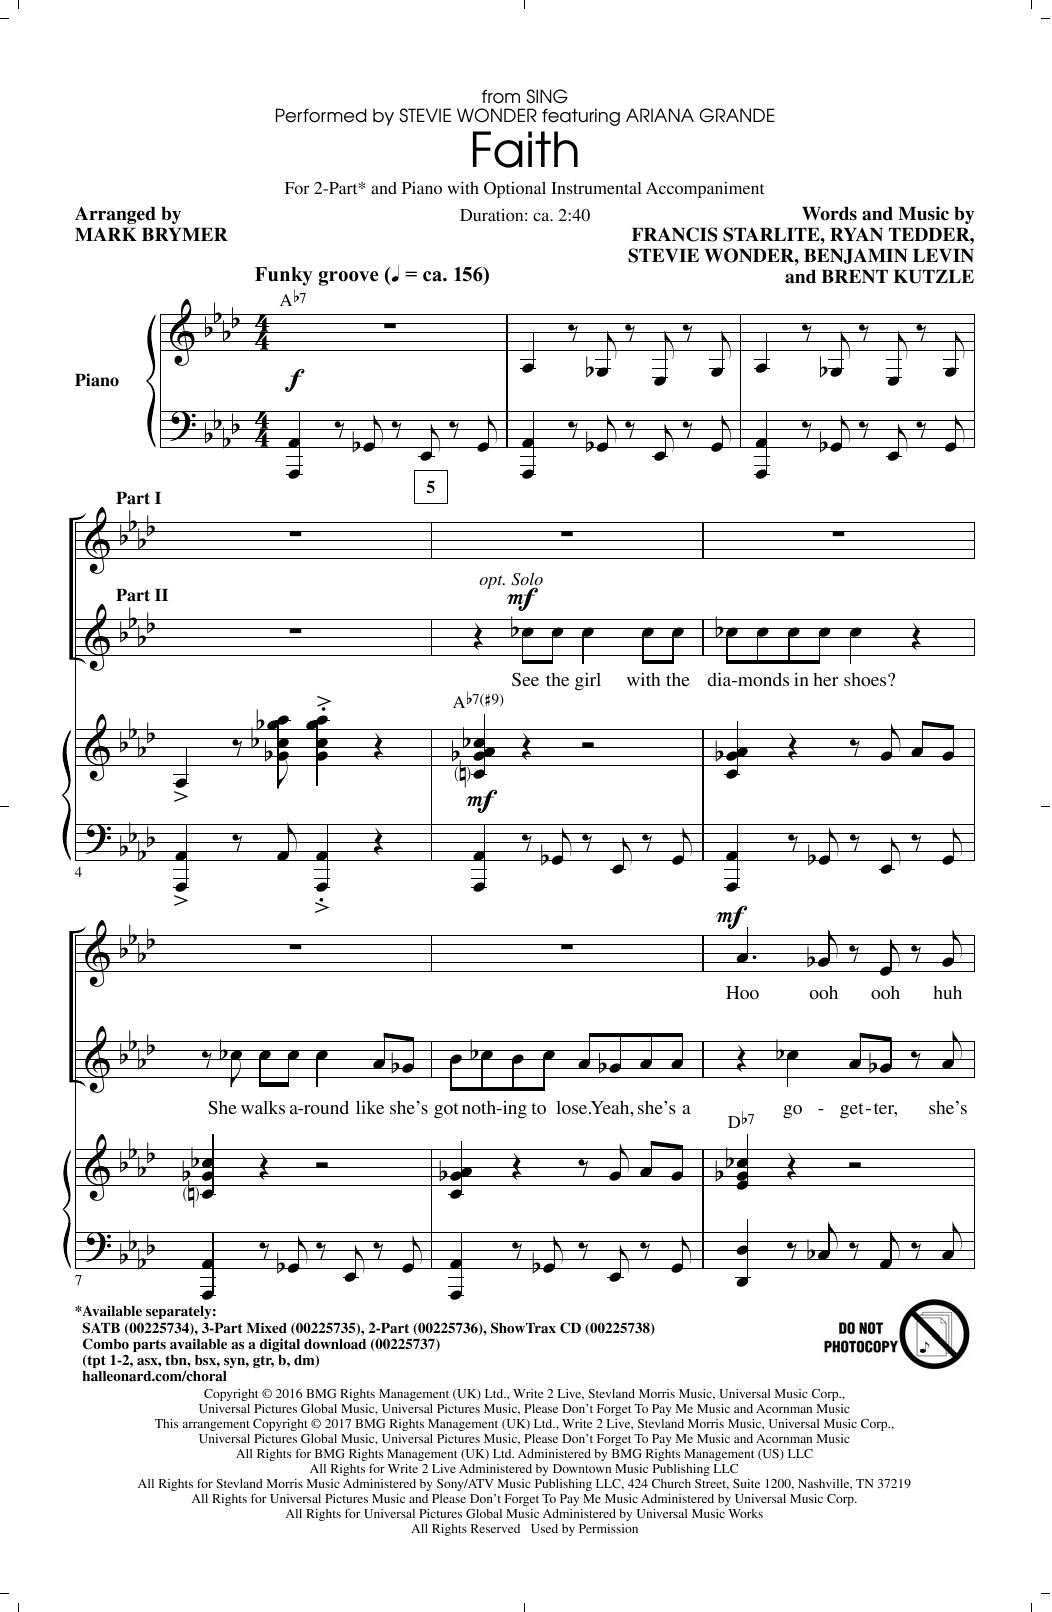 Stevie Wonder feat. Ariana Grande - Faith